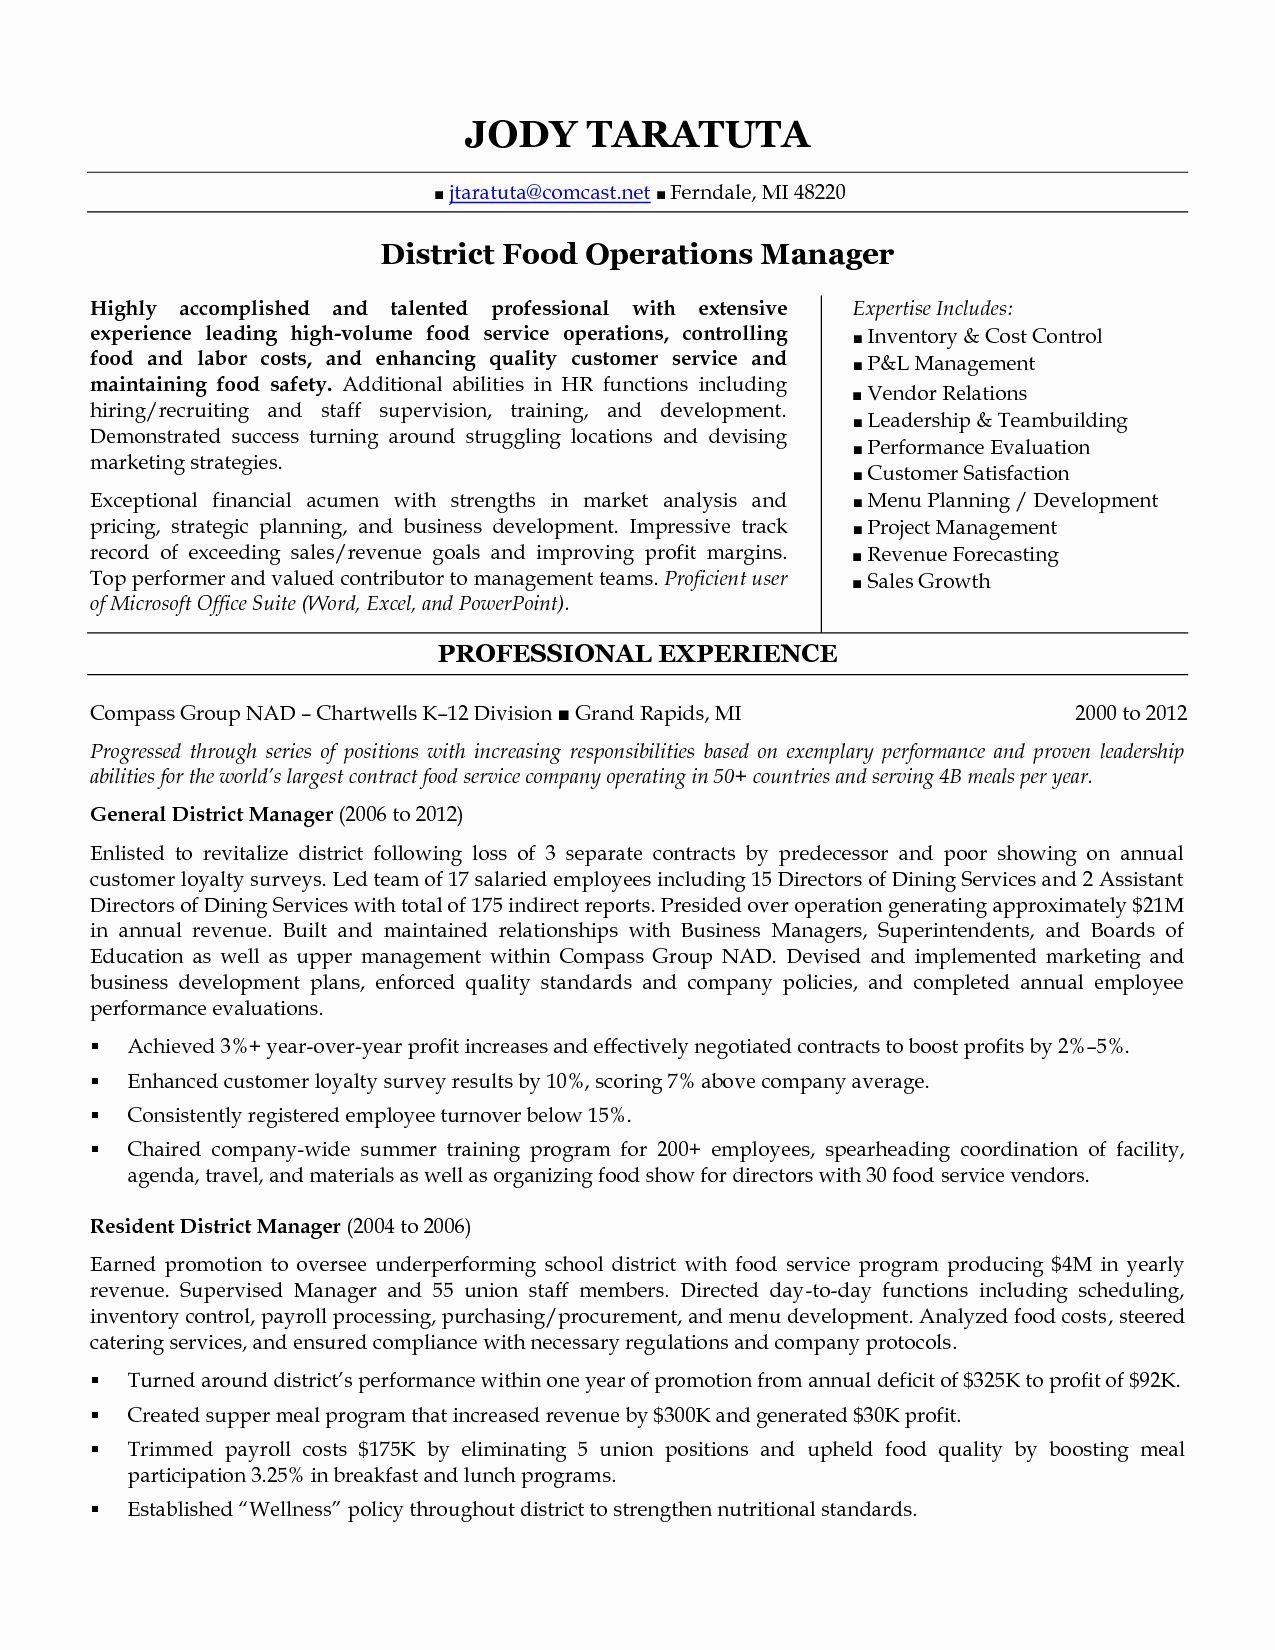 Operations Manager Resume Sample Pdf Elegant District Manager Resume Operations Management Manager Resume Resume